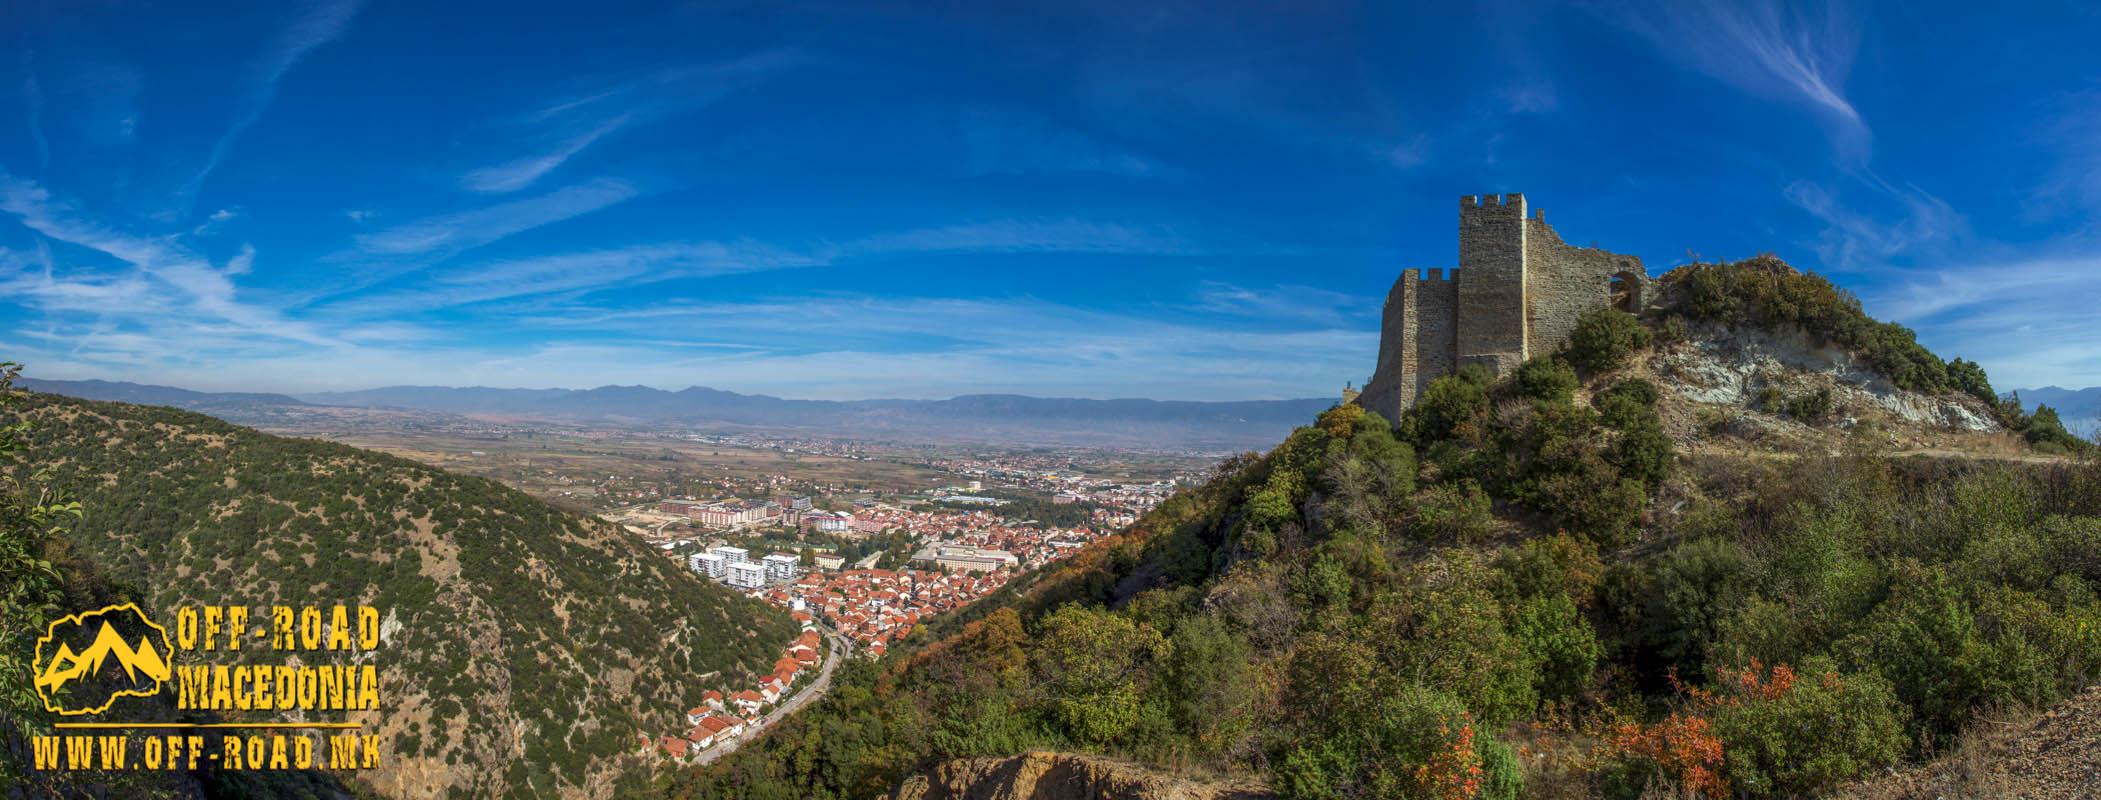 Strumica Fortress - Carevi Kuli (Czar's Towers) - XI century fortress above the city of Strumica